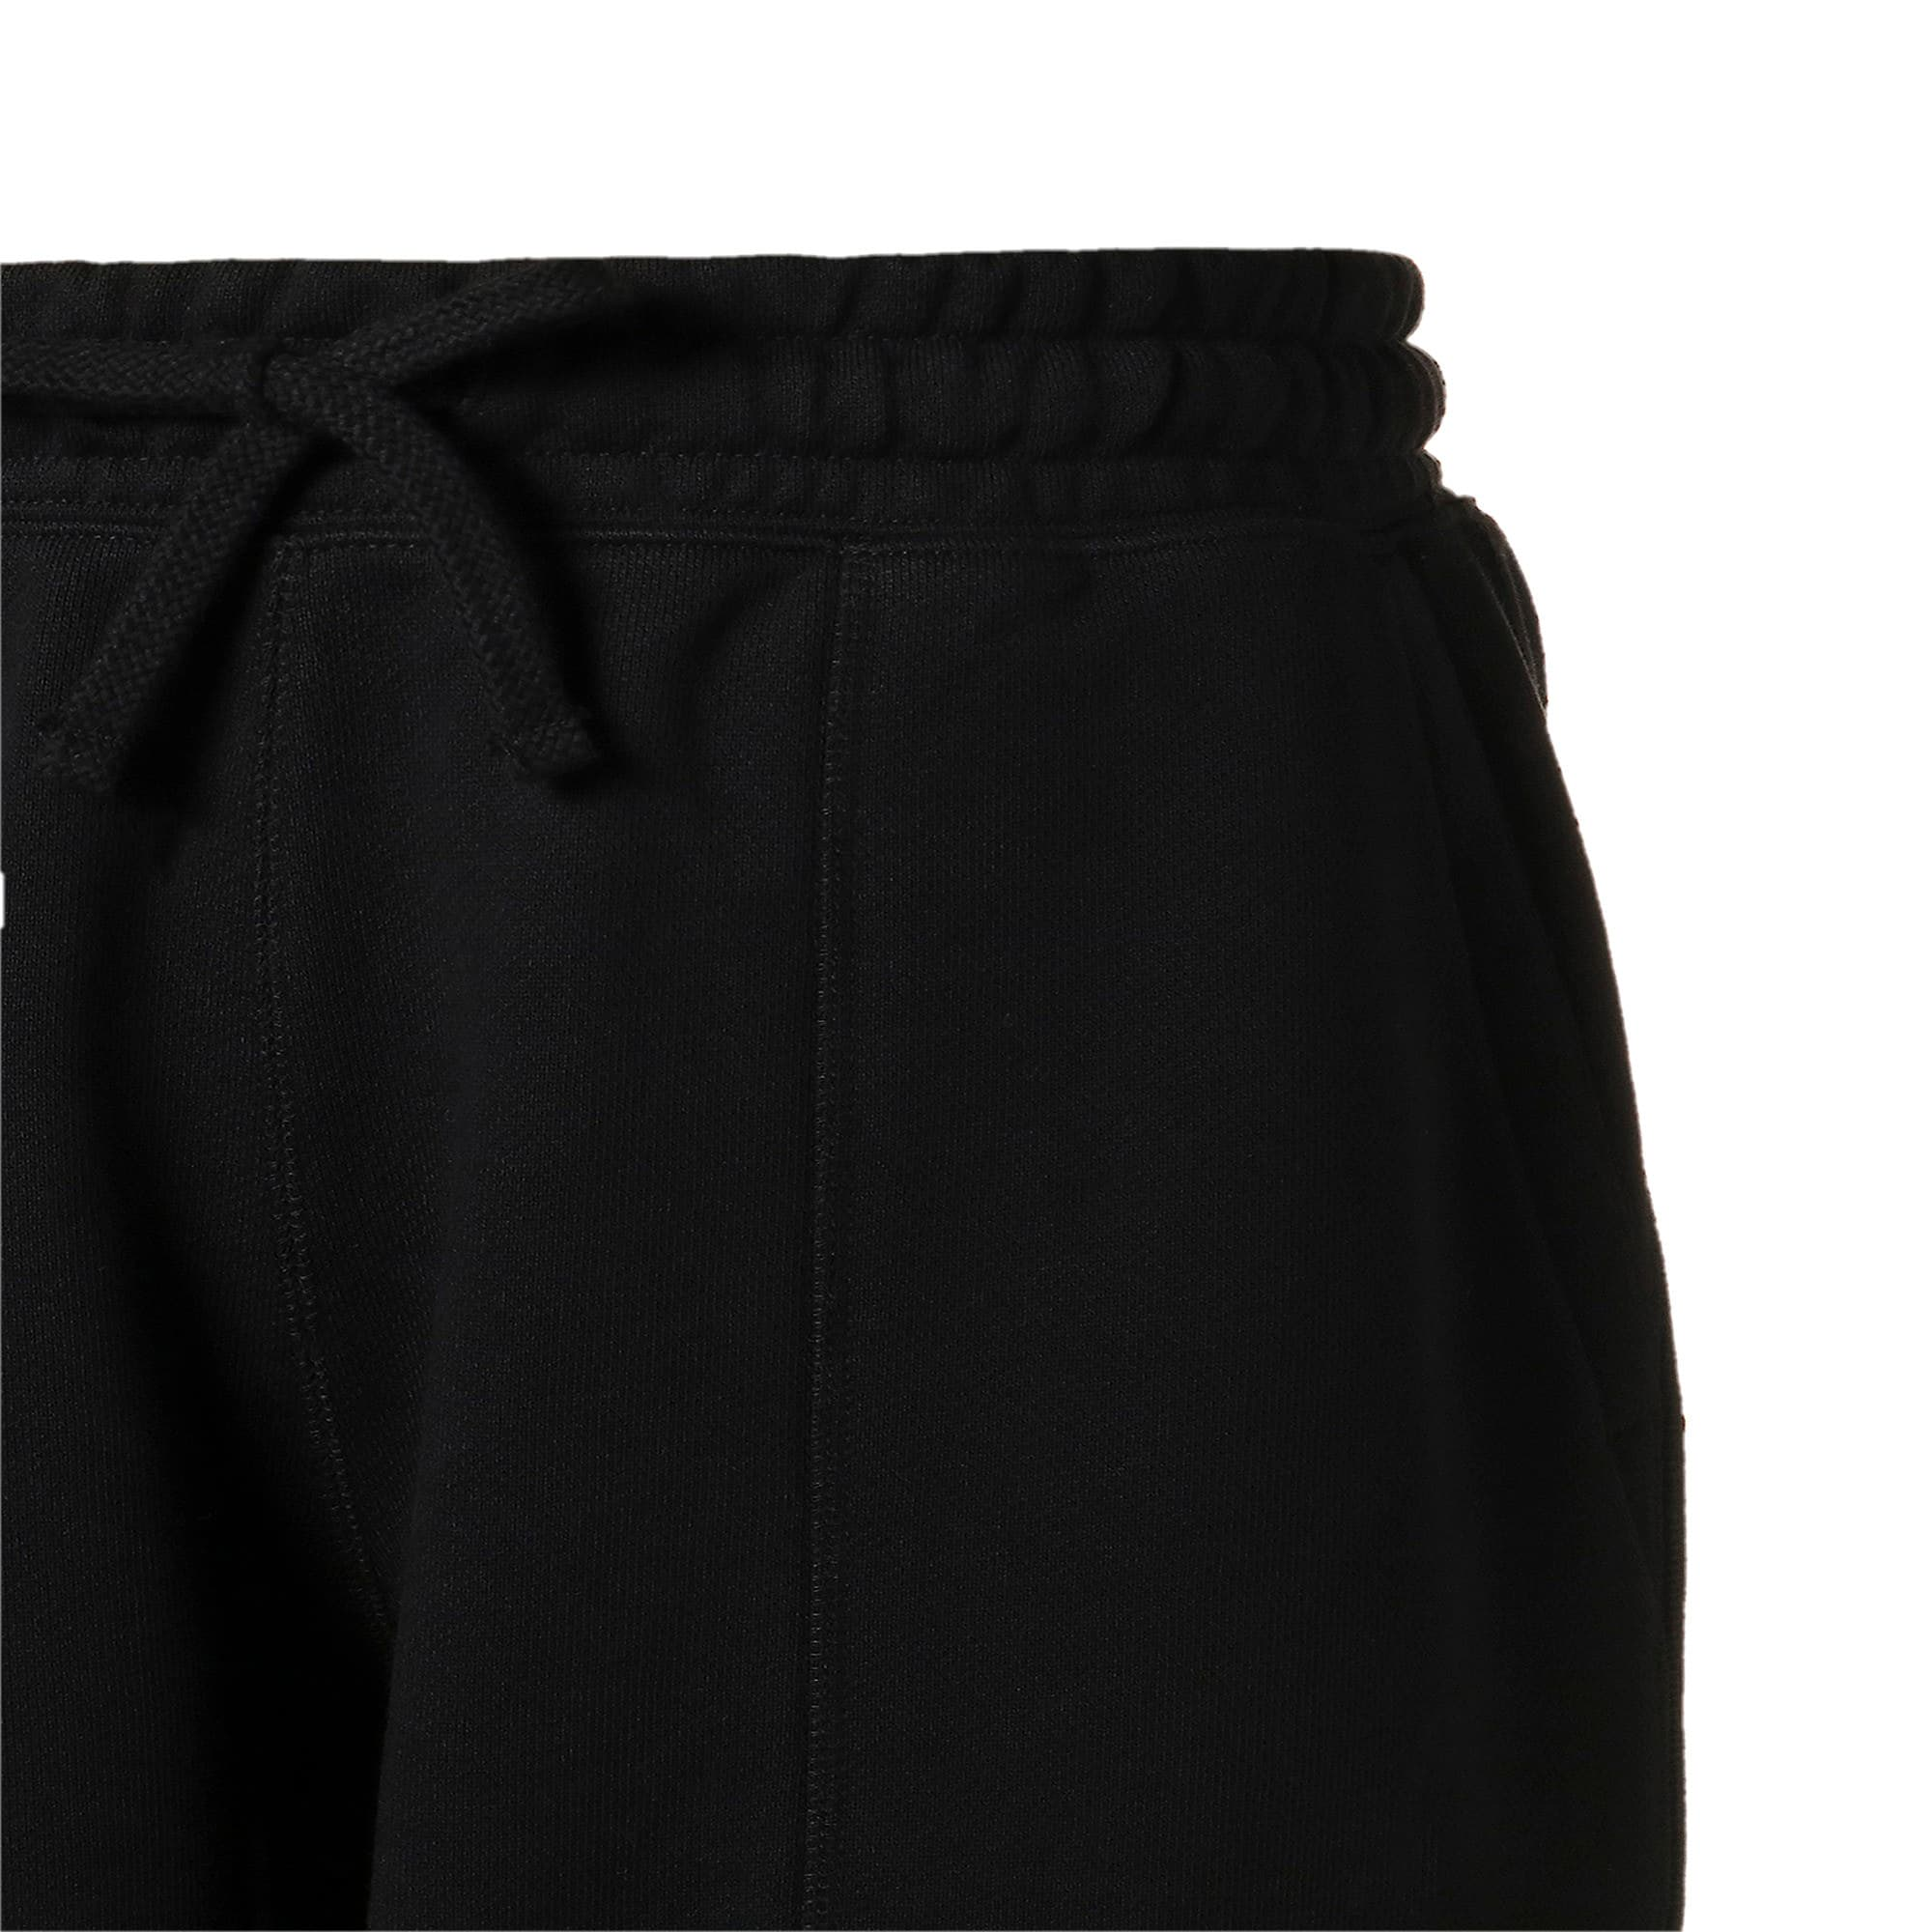 Thumbnail 5 of HEAVY CLASSICS パンツ, Cotton Black, medium-JPN